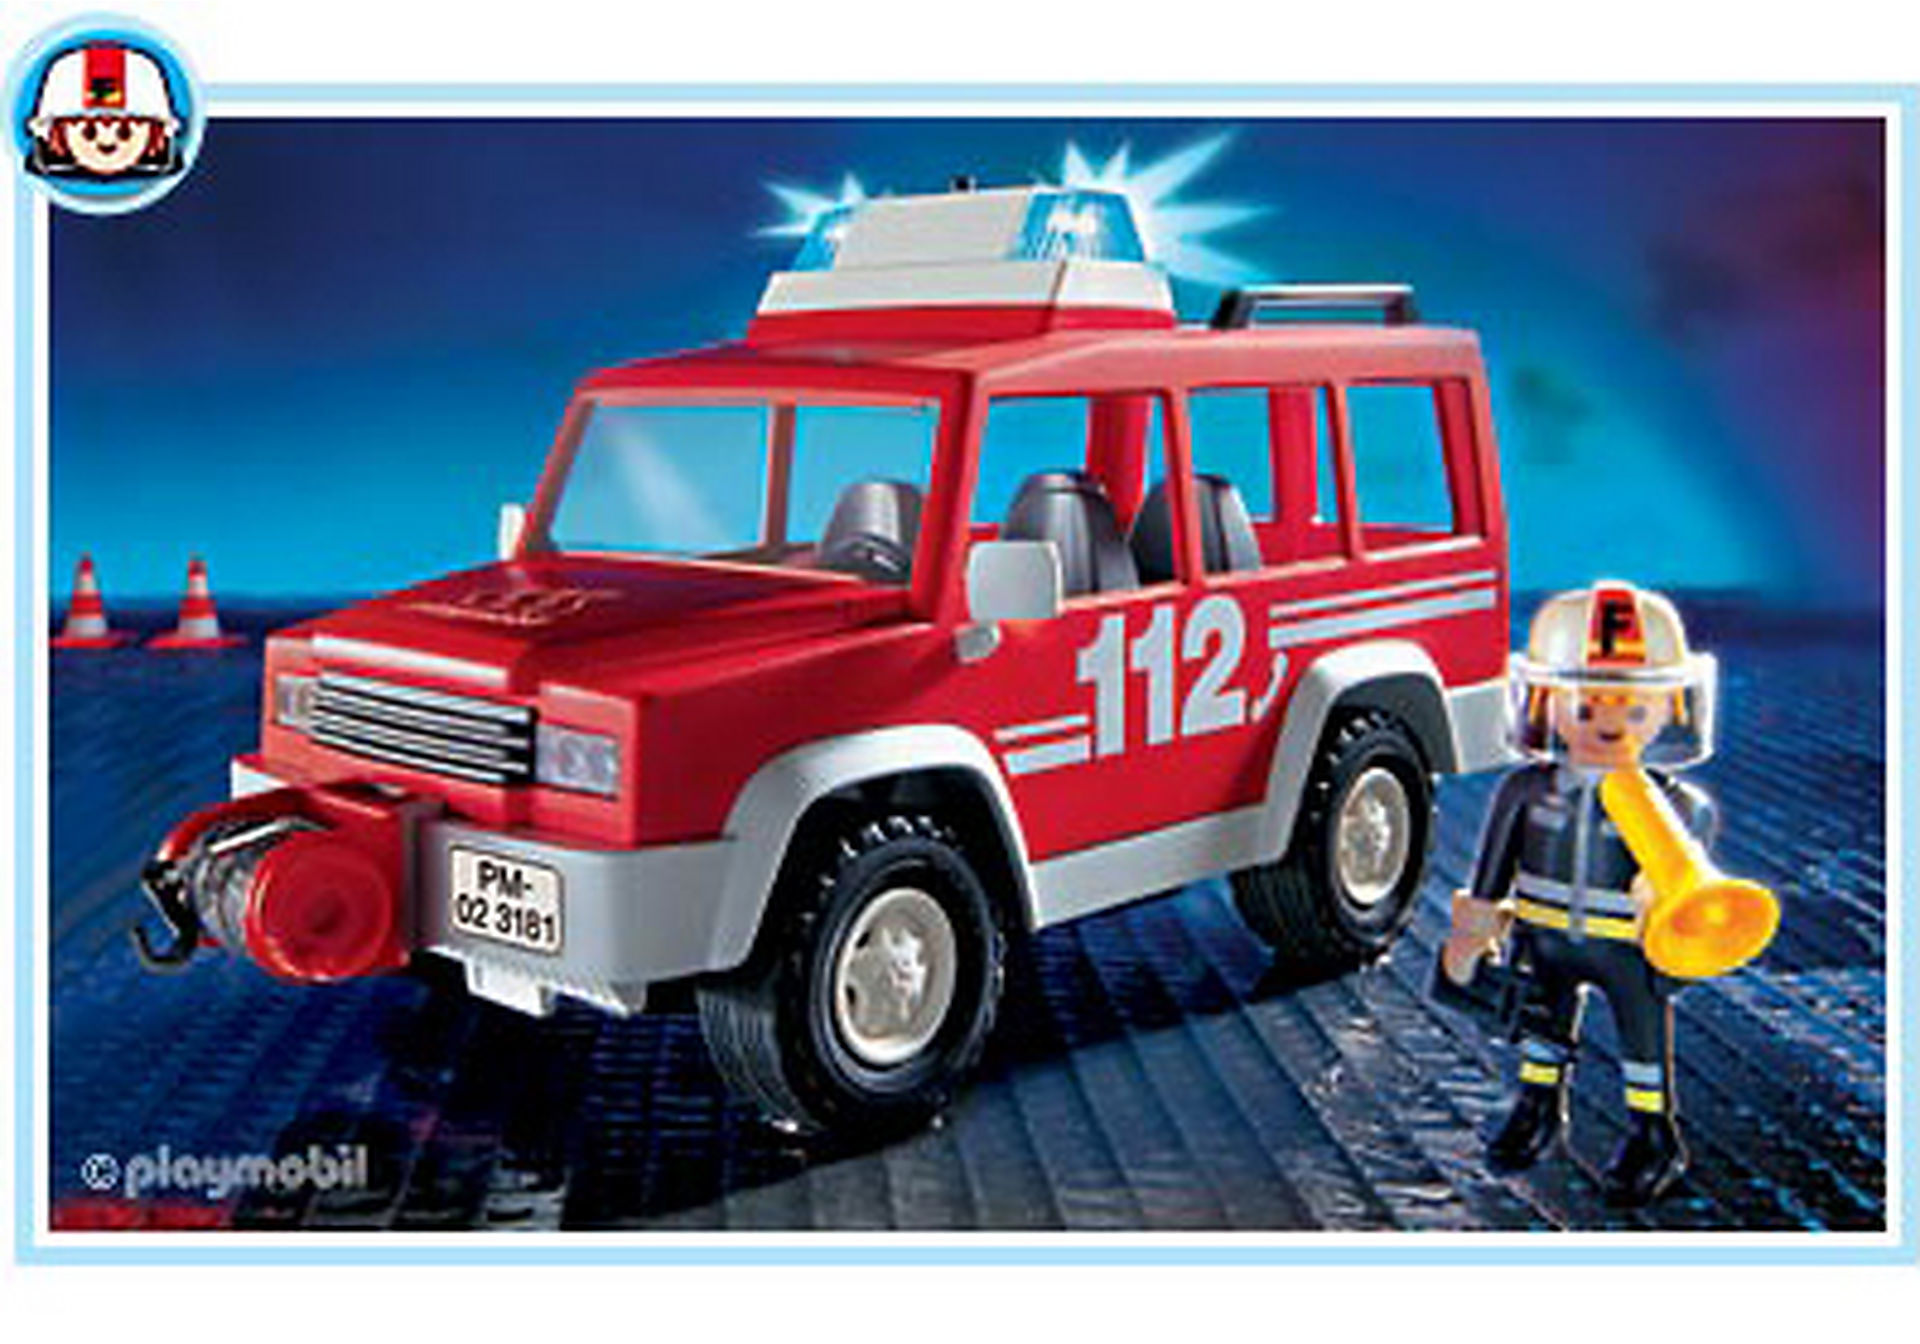 3181-A Feuerwehrvorausfahrzeug zoom image1